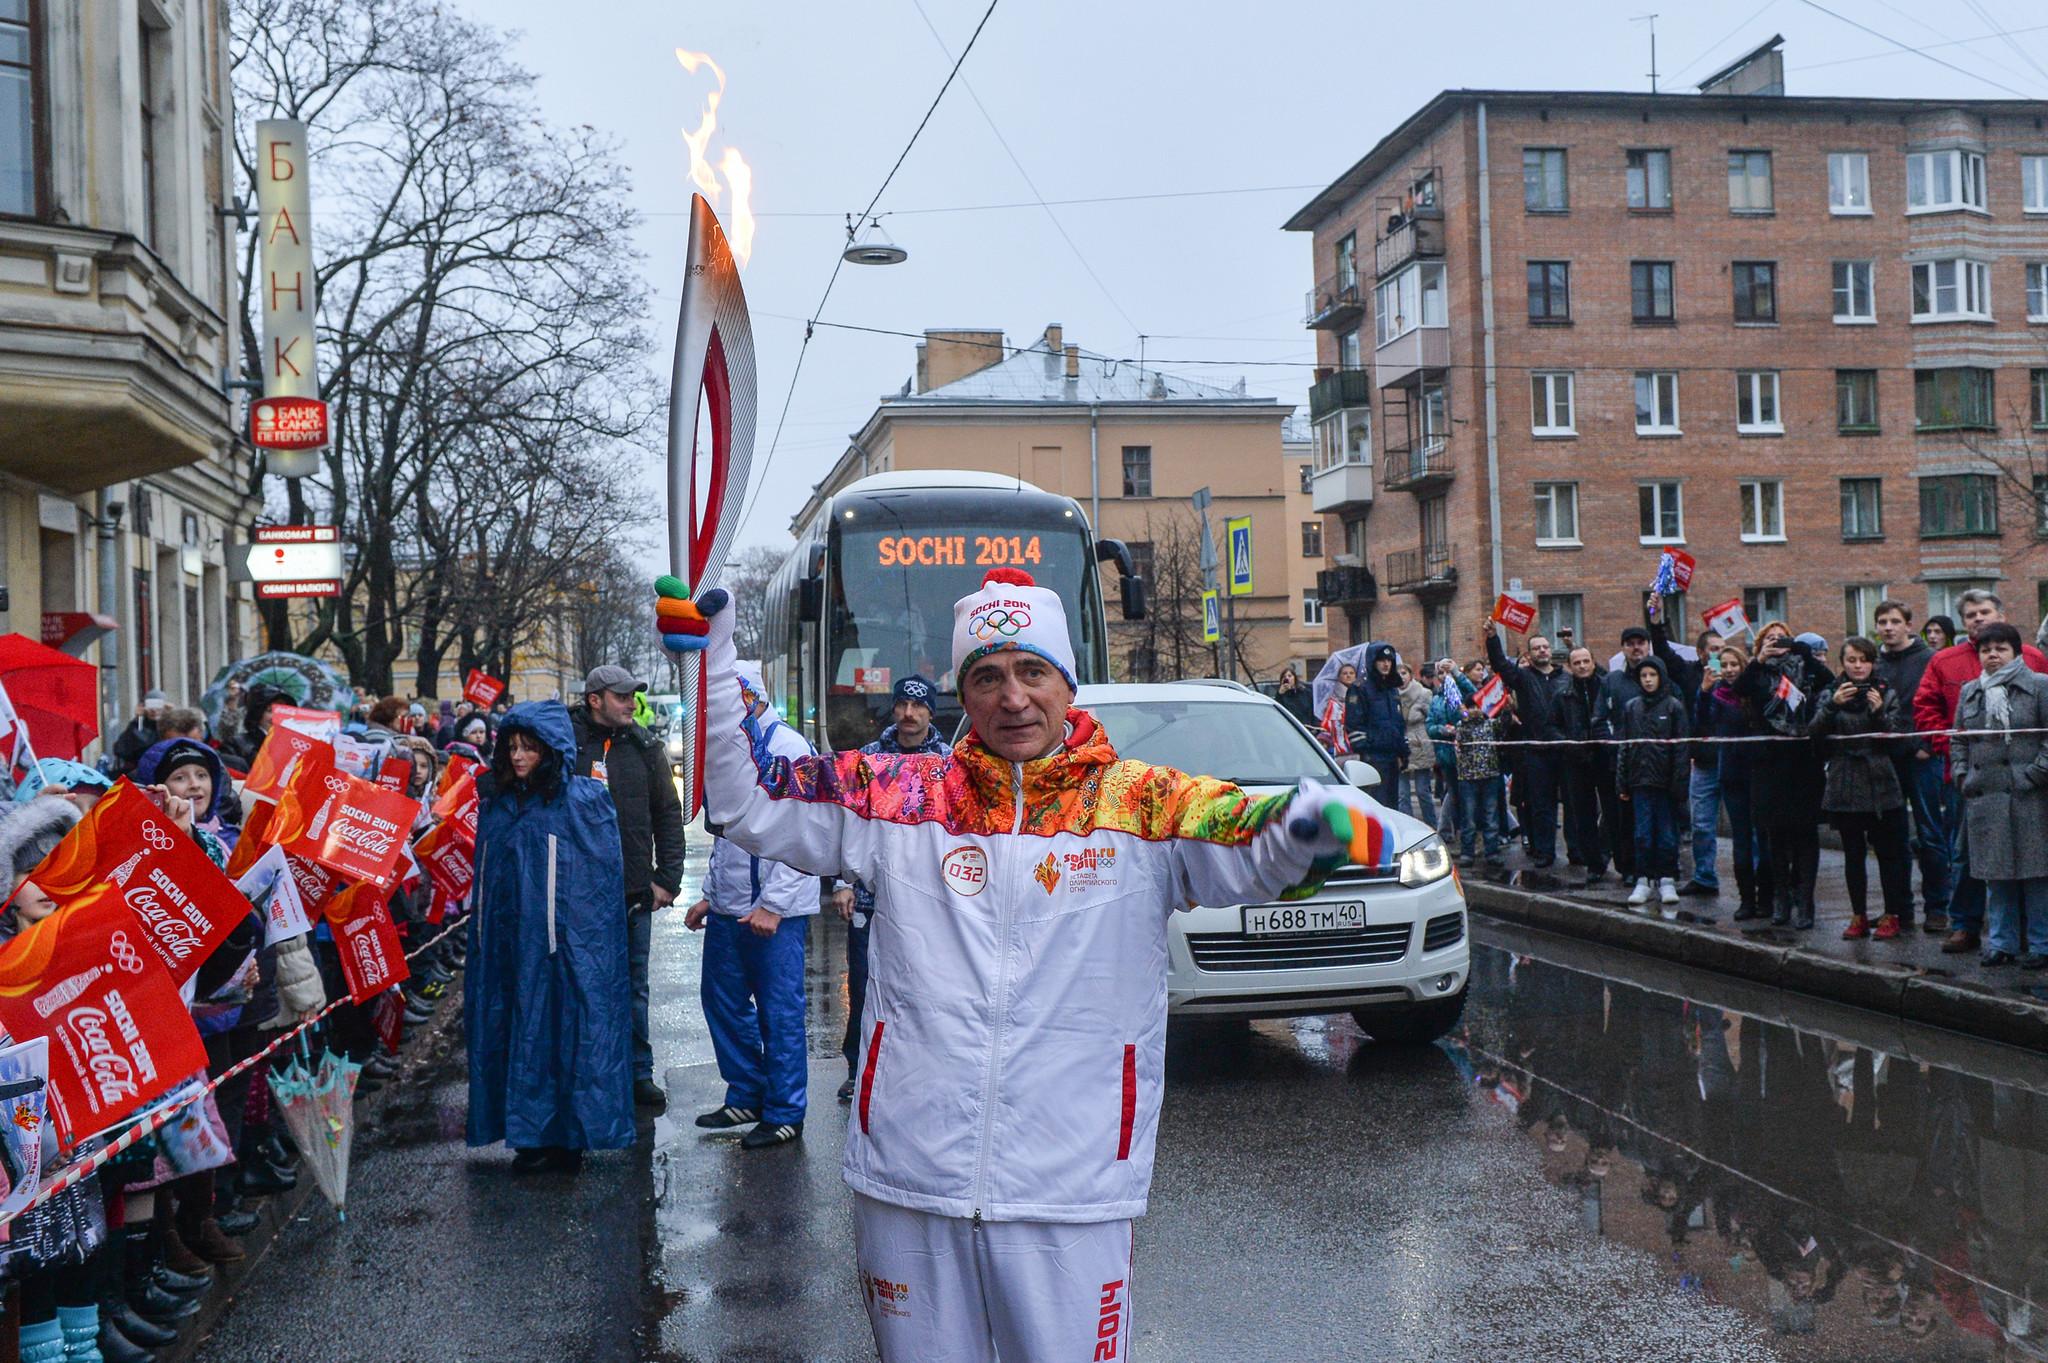 схема эстафеты олимпийского огня сочи 2014